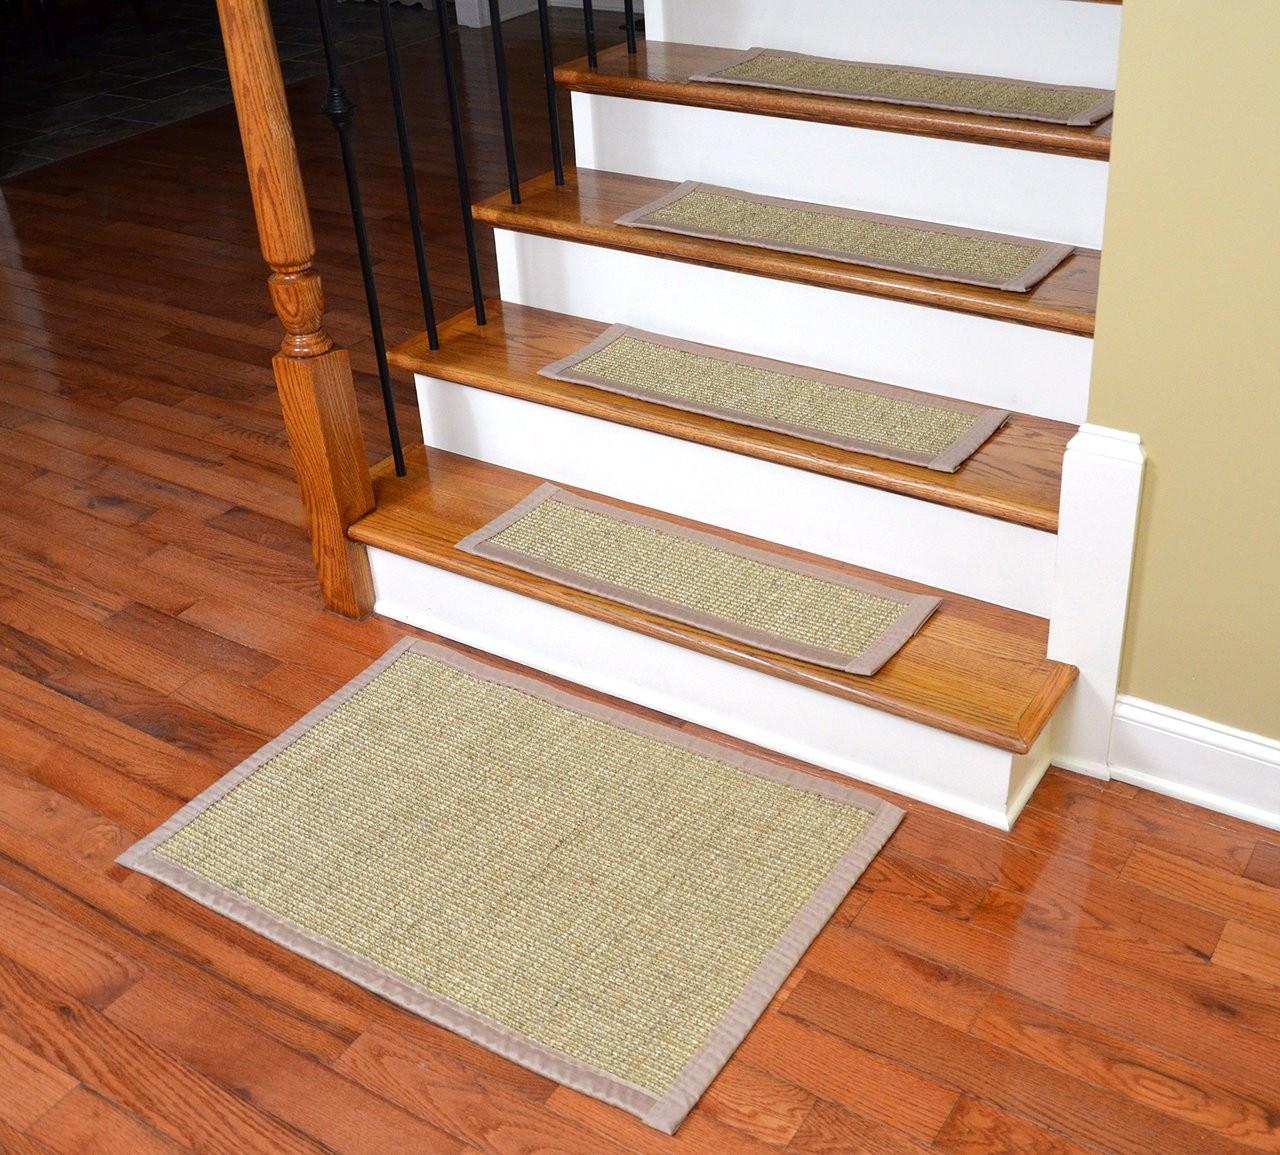 Dean Sisal Carpet Stair Treads Set Of 13 W Landing Mat | Carpet Steps For Stairs | Glitter Carpet | Elegant | Middle Open Concept | Heavy Duty | Gorgeous